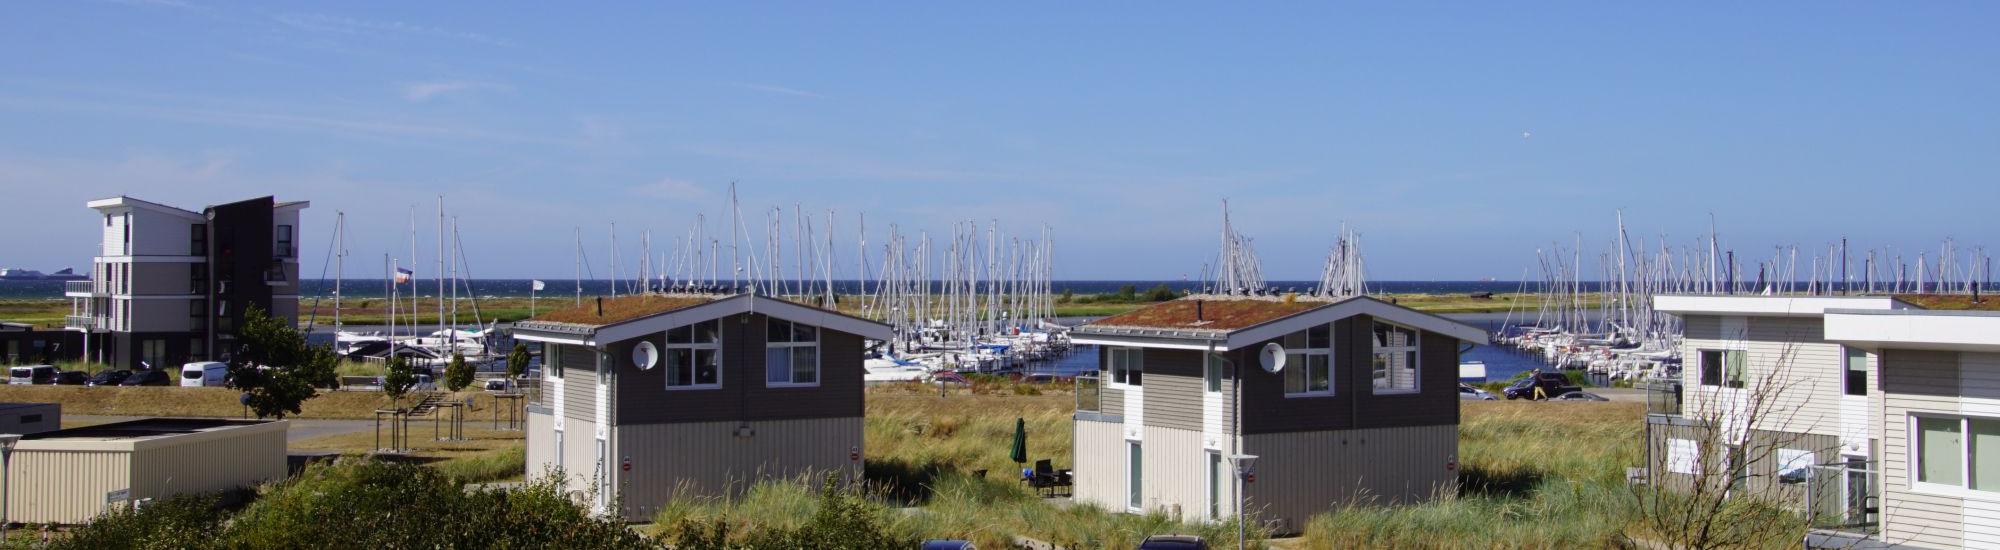 Appartement direkt an der Ostsee